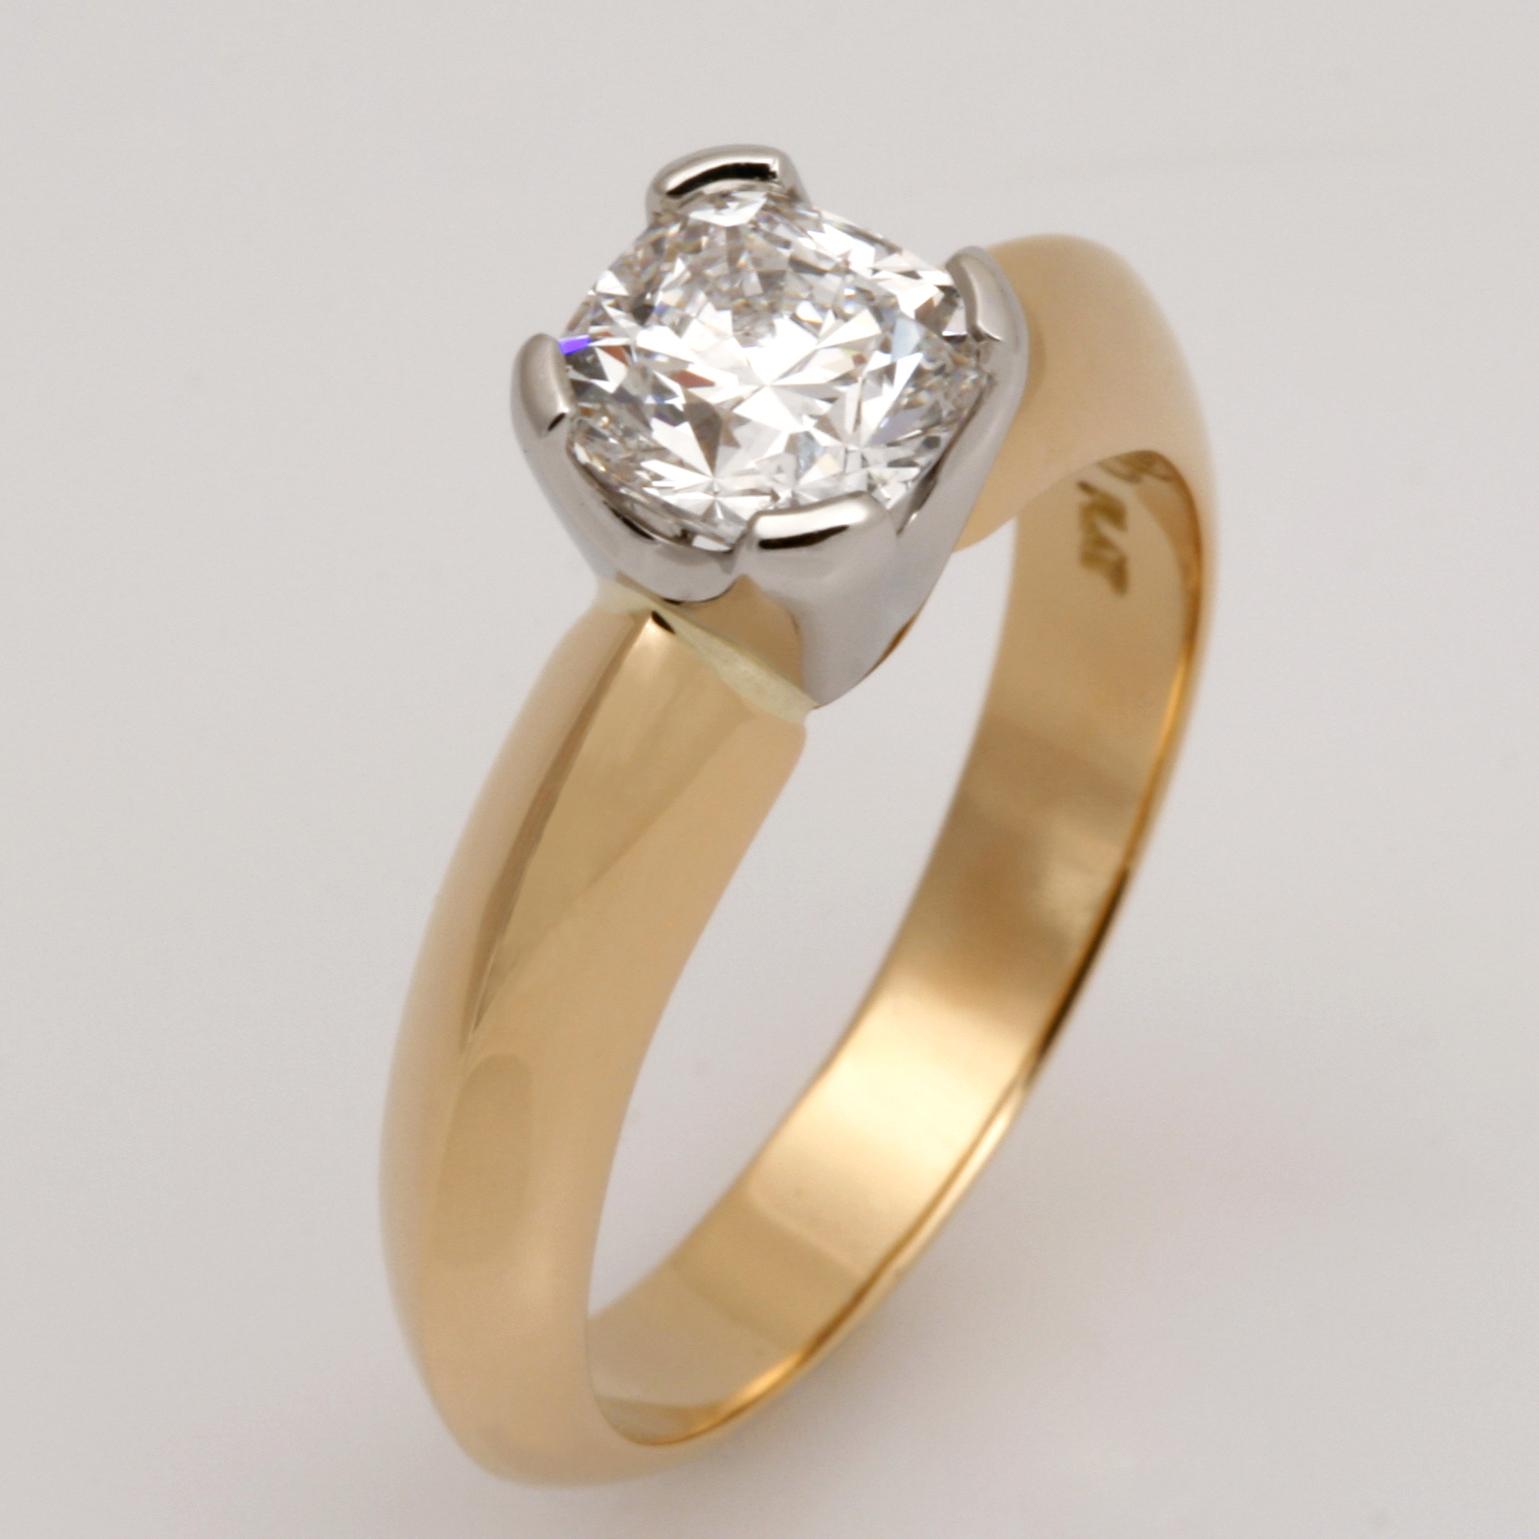 Handmade 18ct yellow gold ring featuring a cushion cut diamond